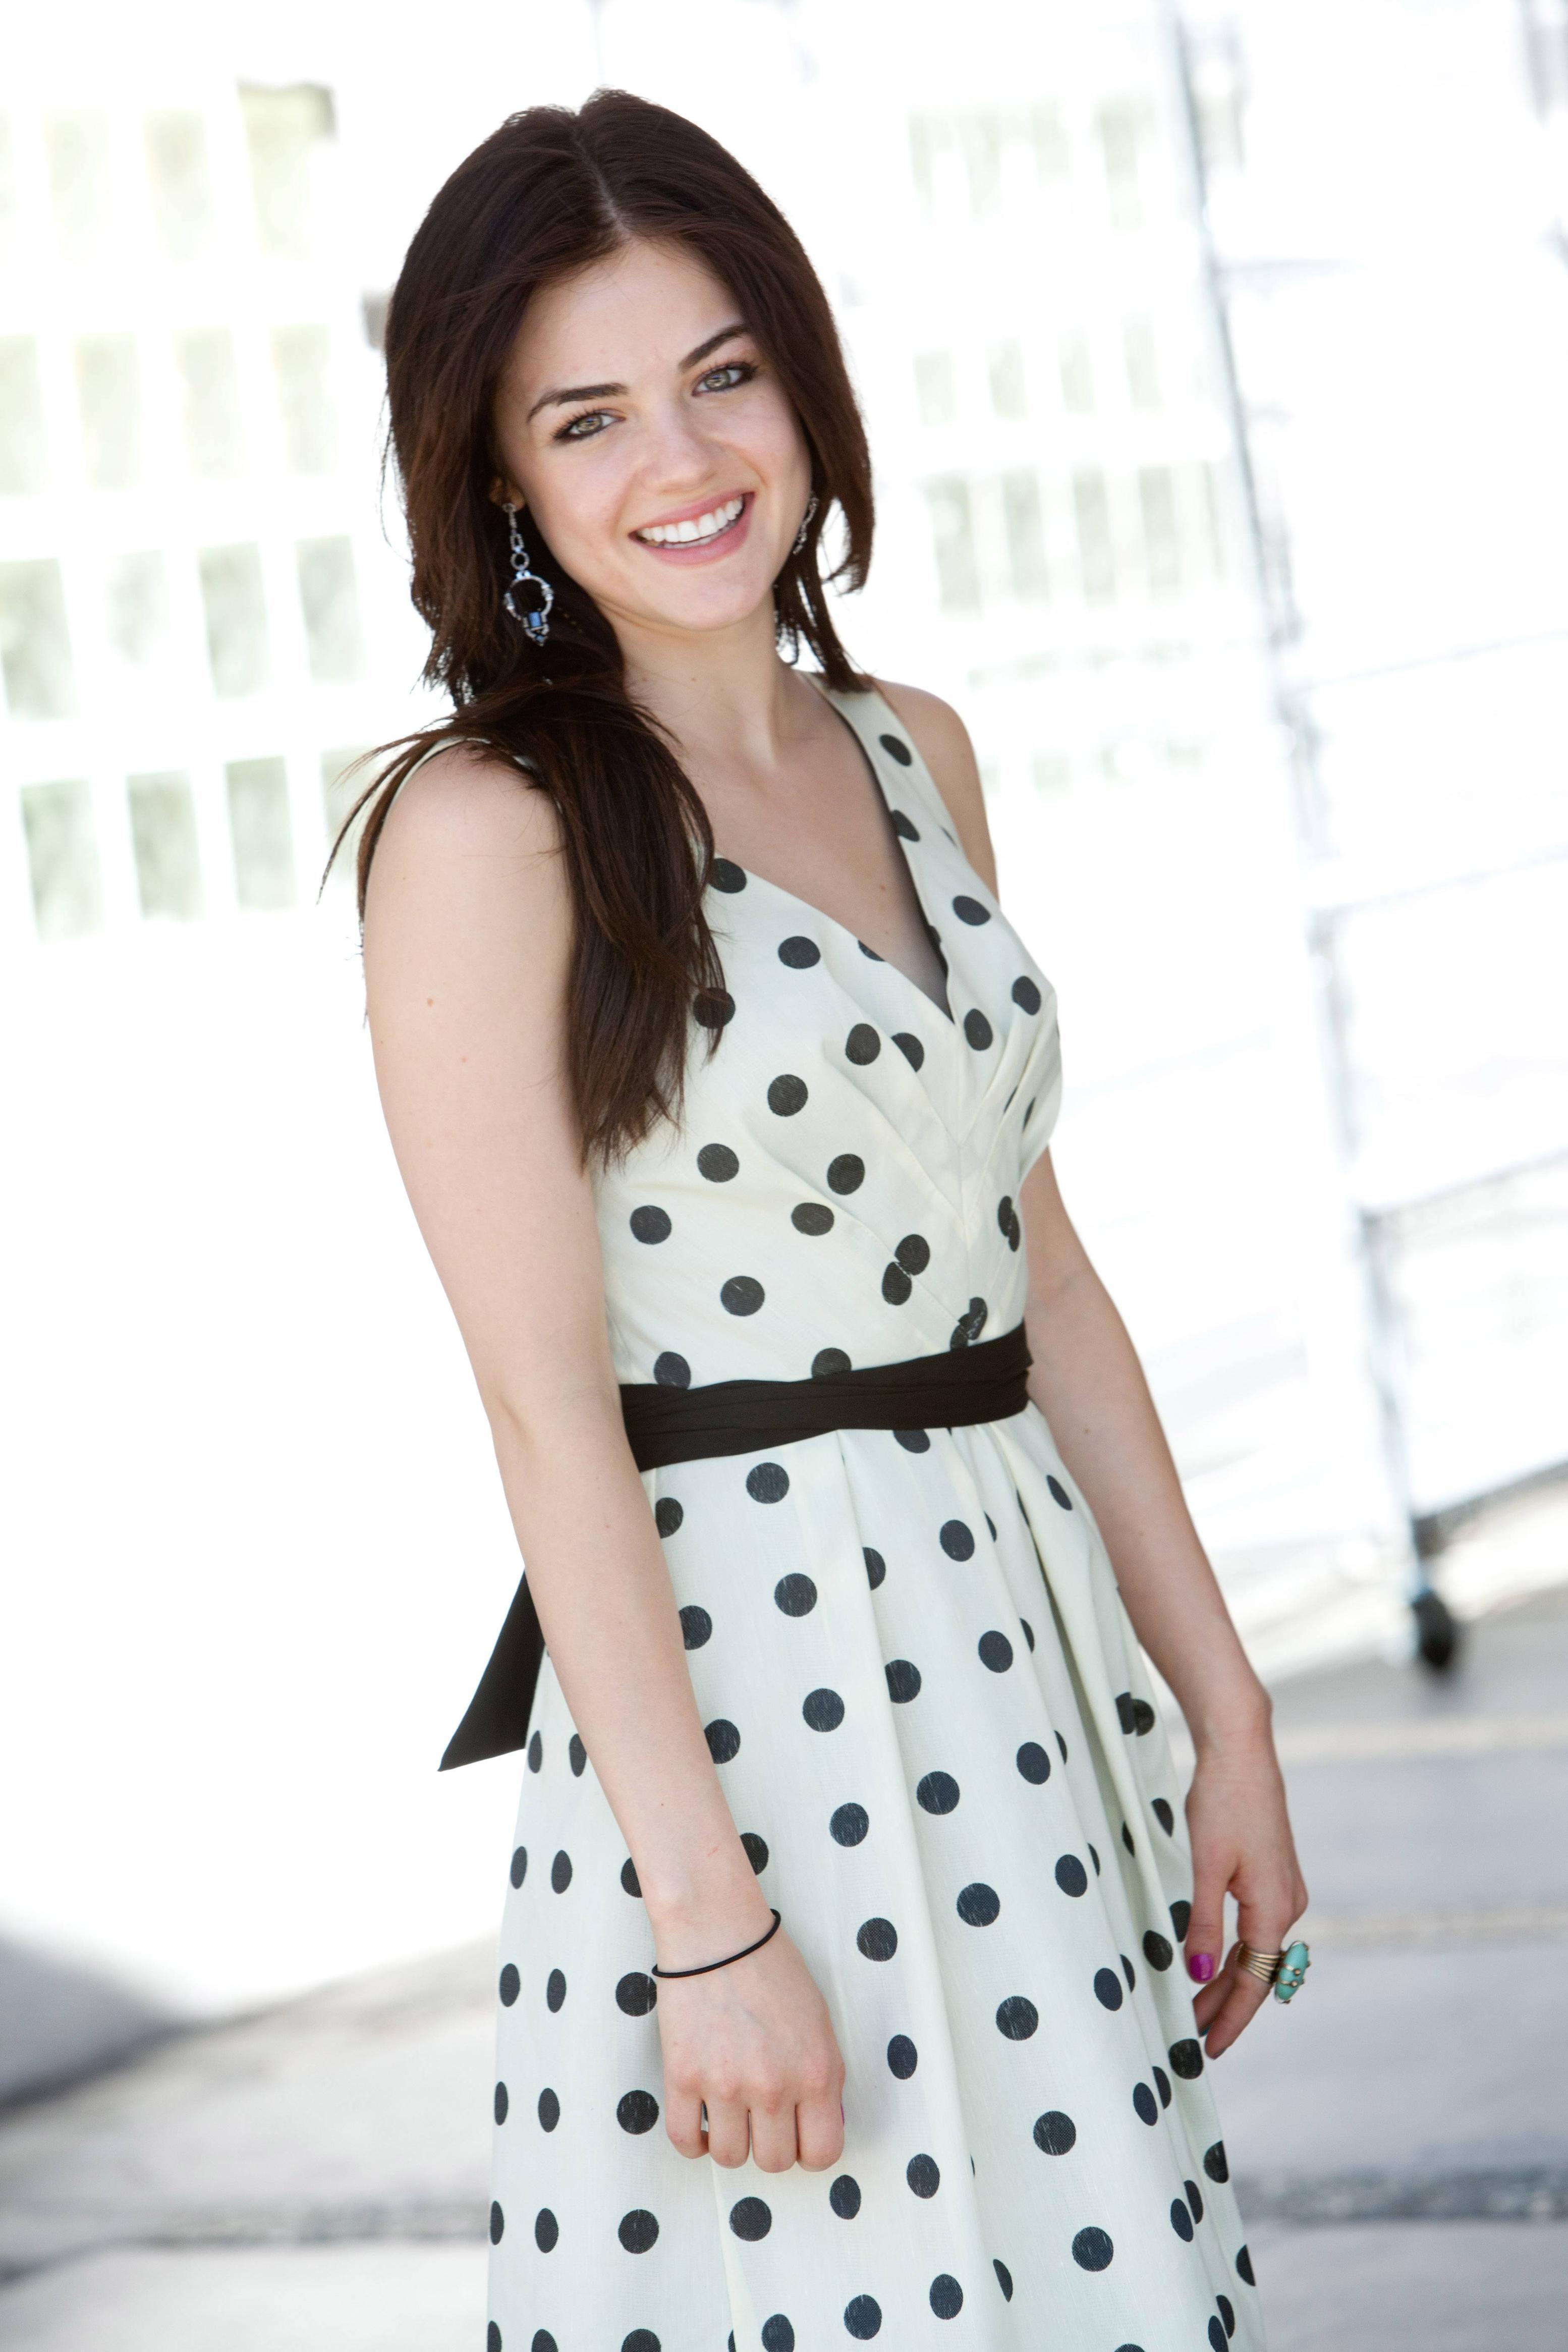 Lucy Hale - Tiffany Rose Photoshoot | pornpixelfinder